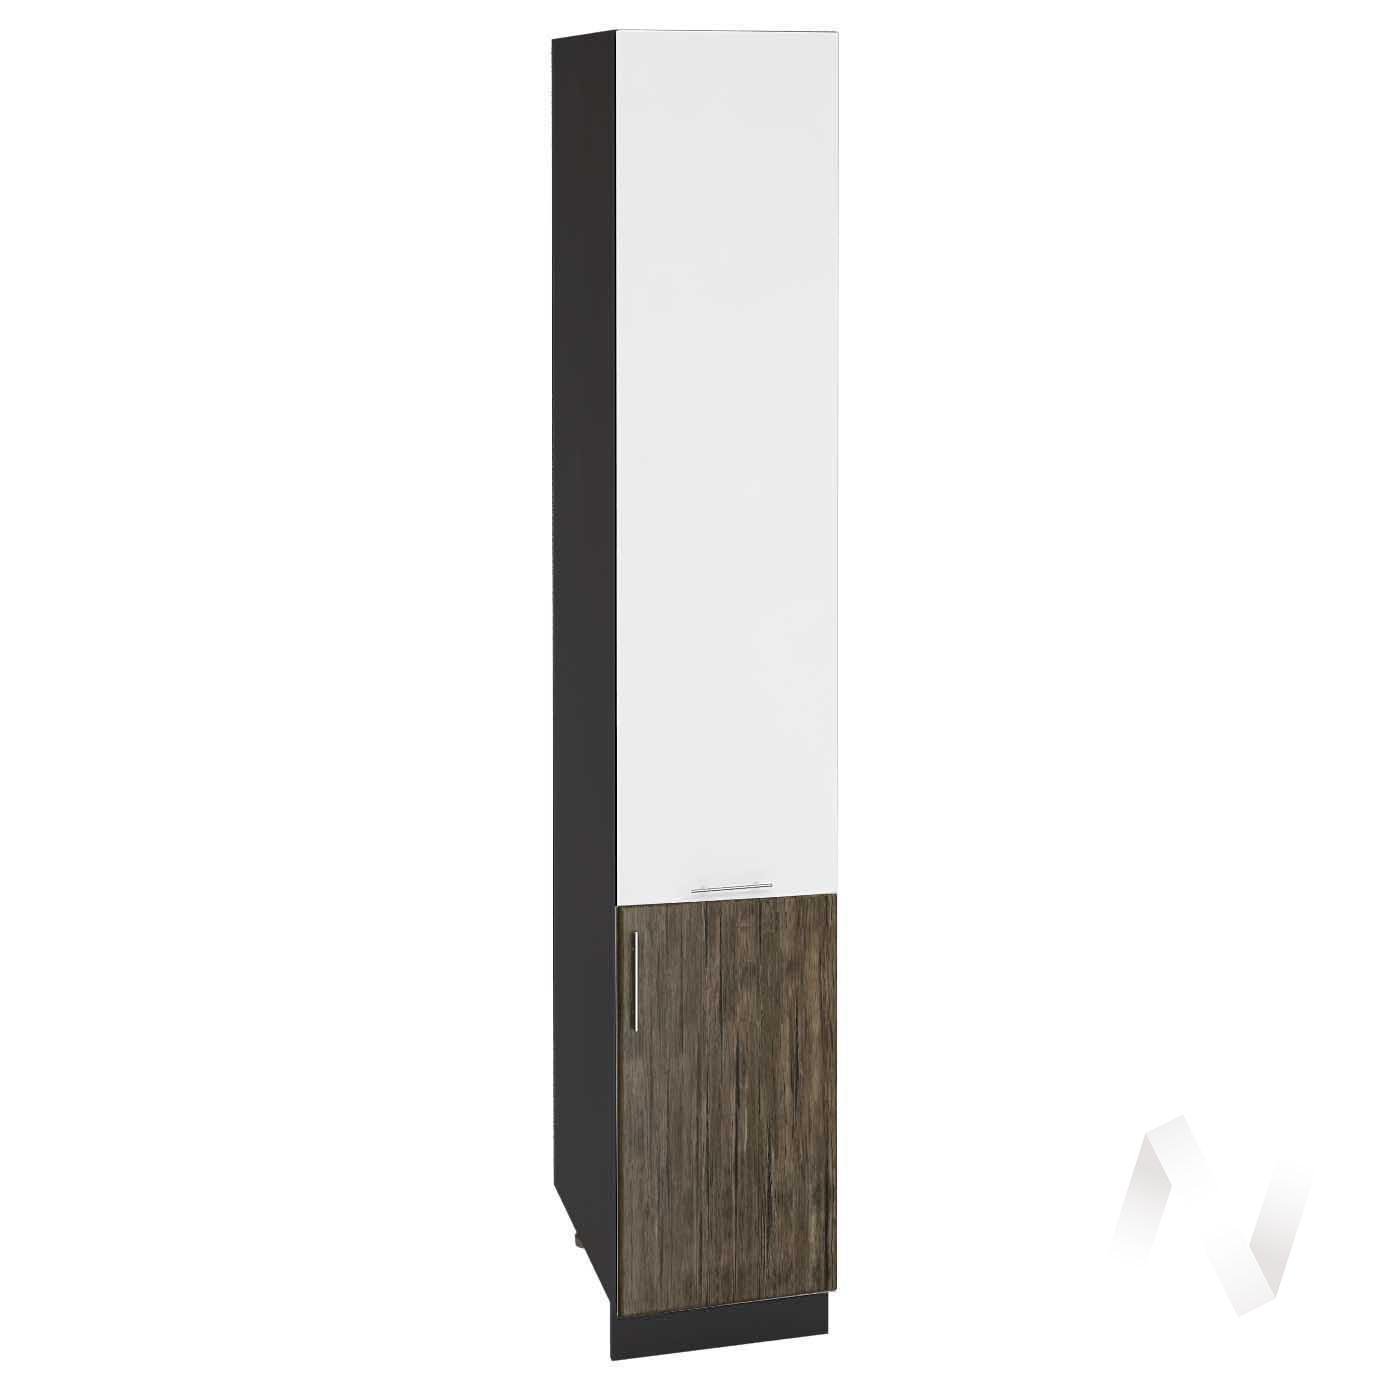 "Кухня ""Норден"": Шкаф пенал 400Н, ШП 400Н (старое дерево/белый глянец/корпус венге)"